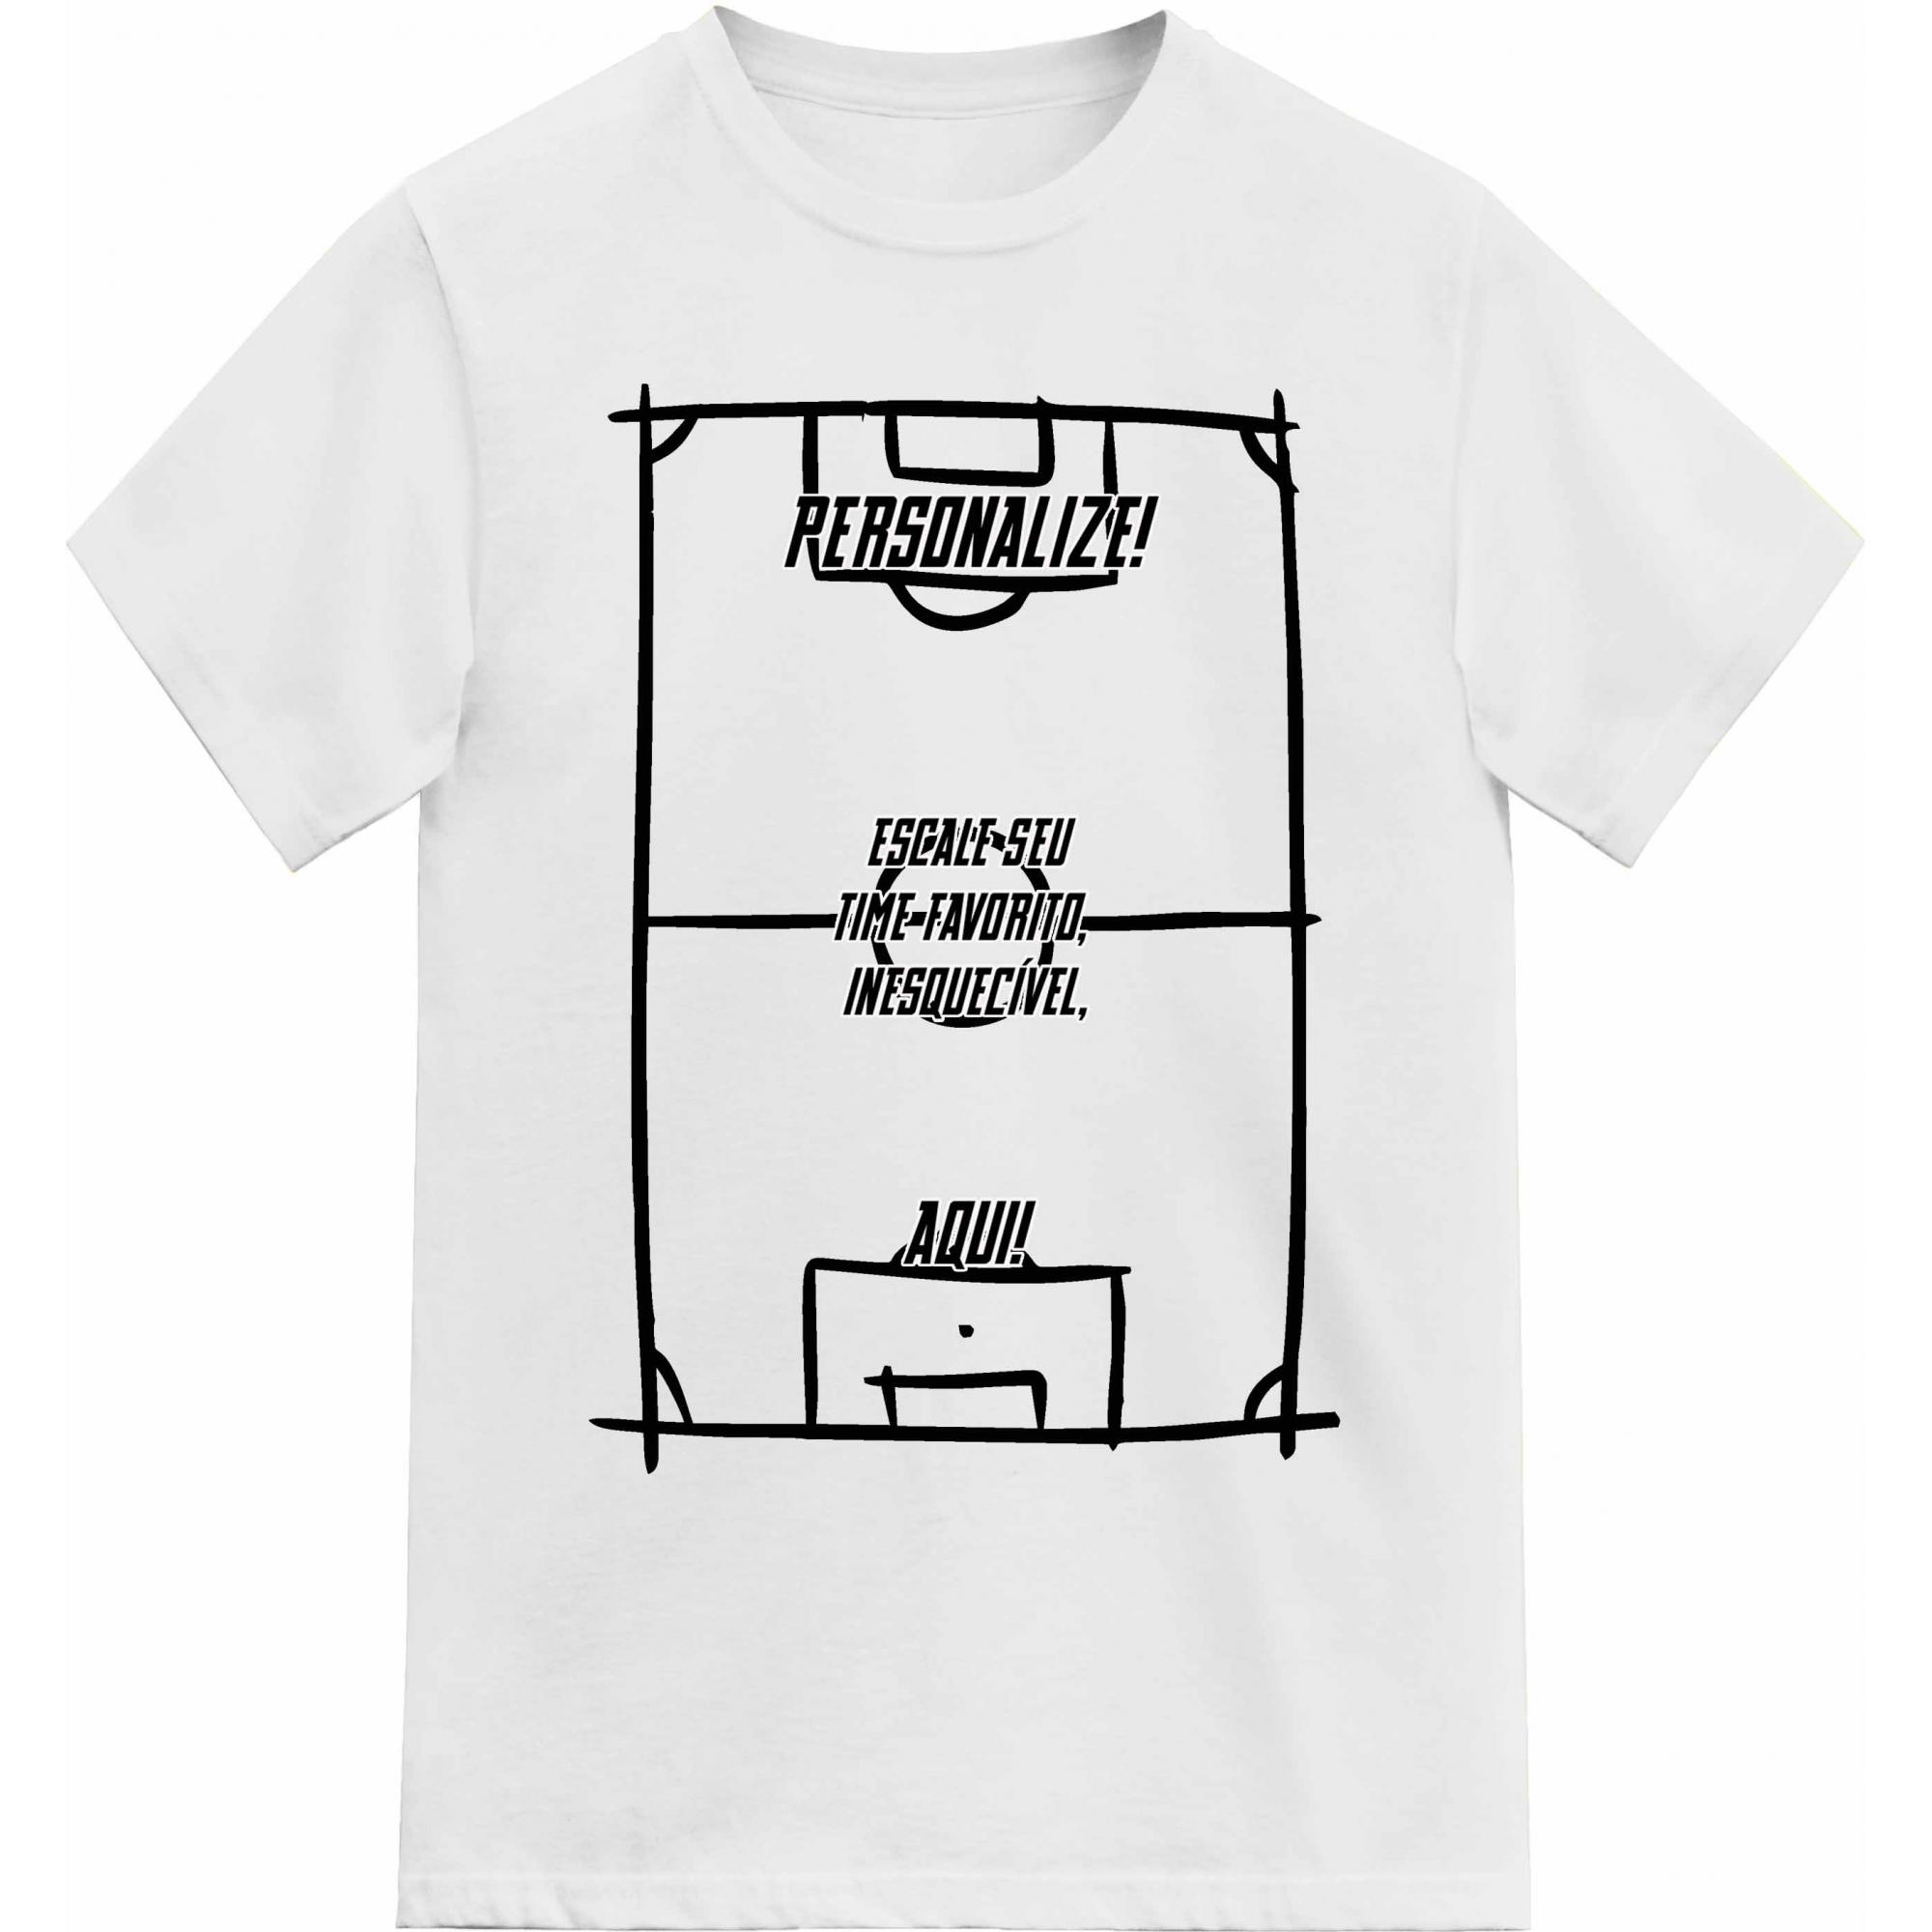 Camiseta Personalizada Escale seu Time